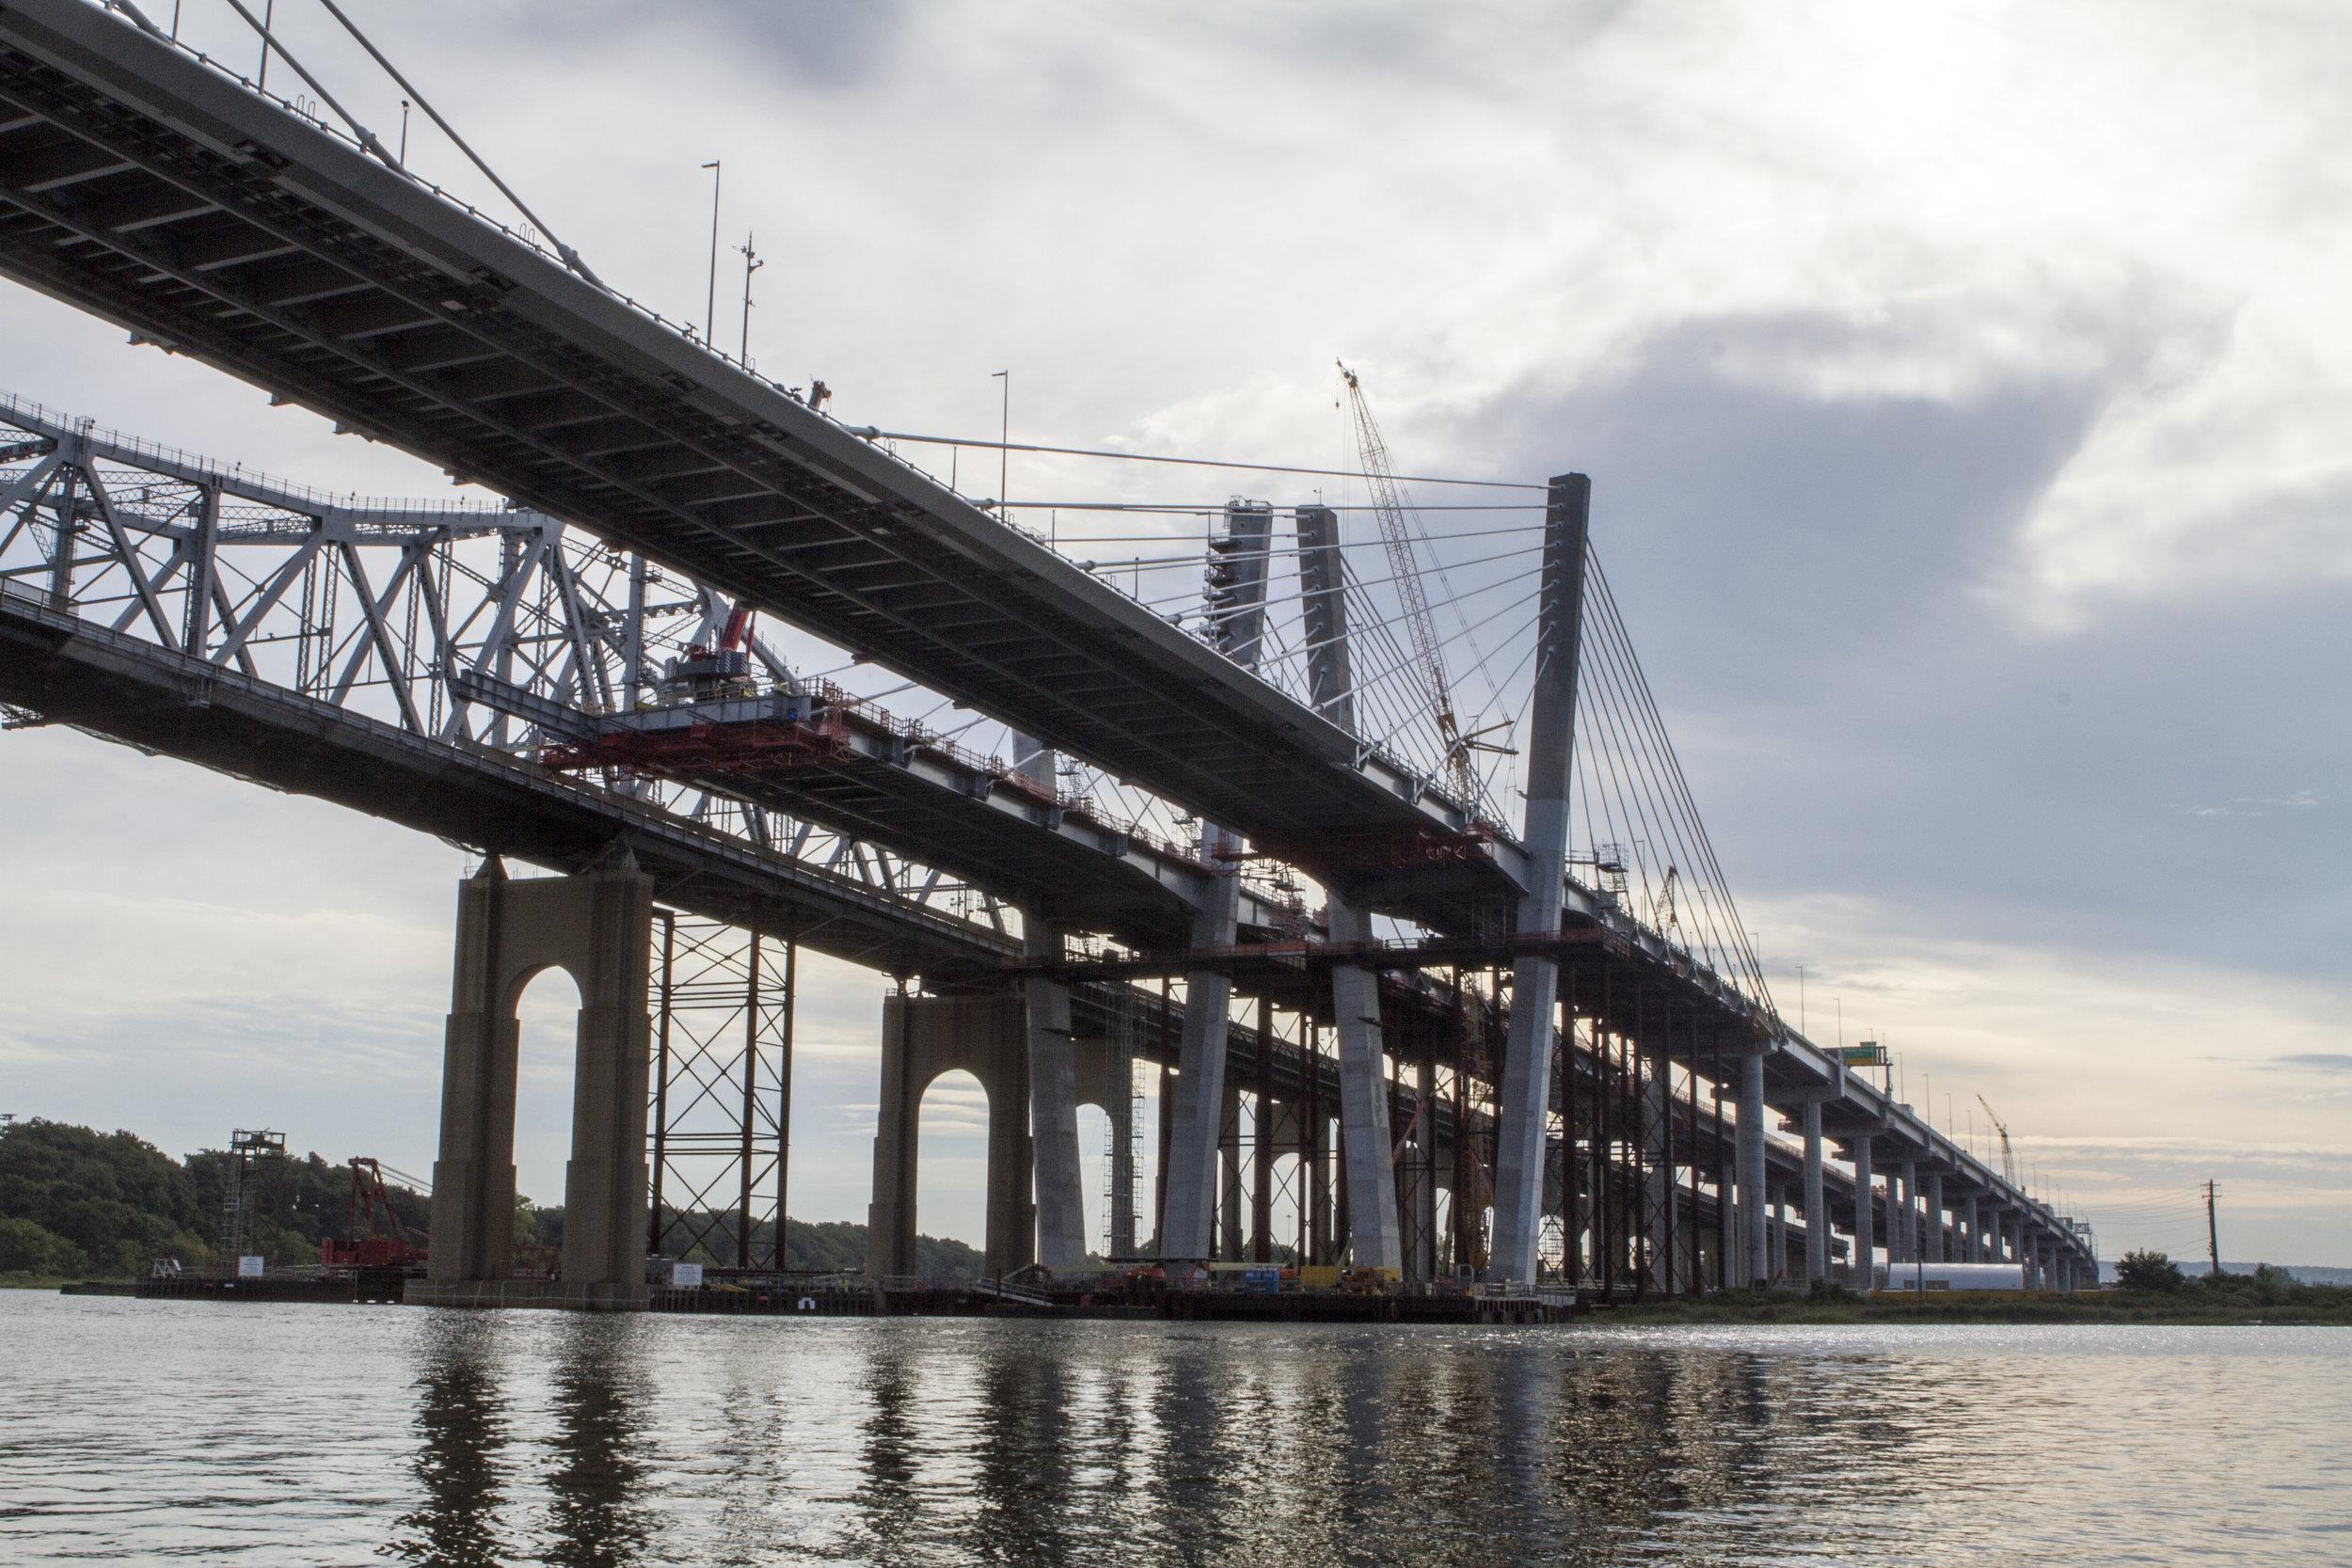 Goethals Bridge Modernization Program